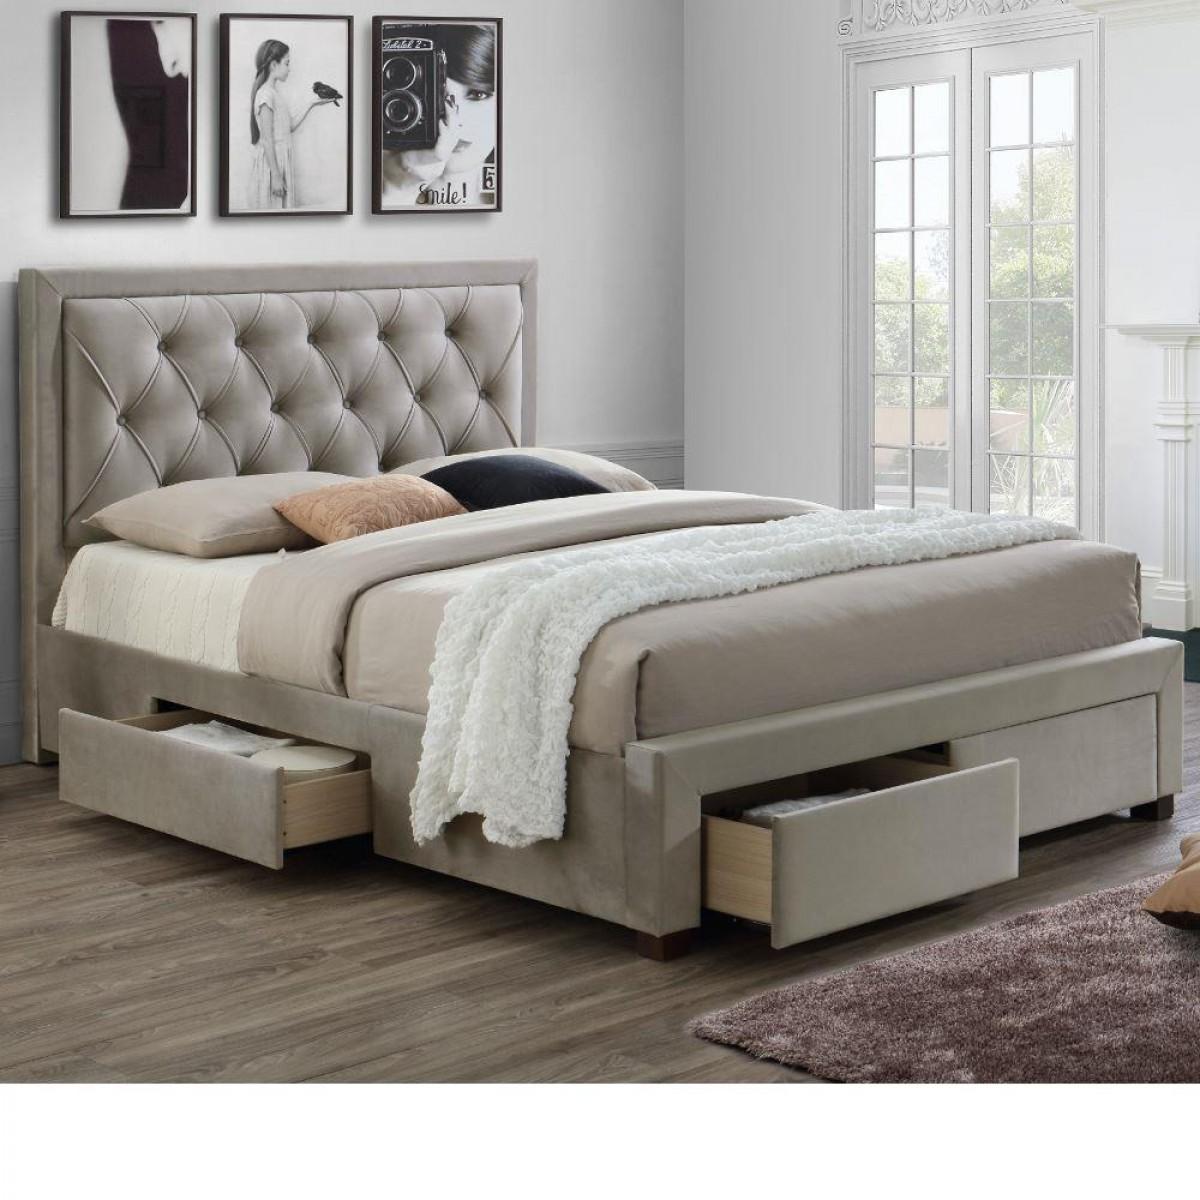 Woodbury Warm Stone Fabric 4 Drawer Storage Bed